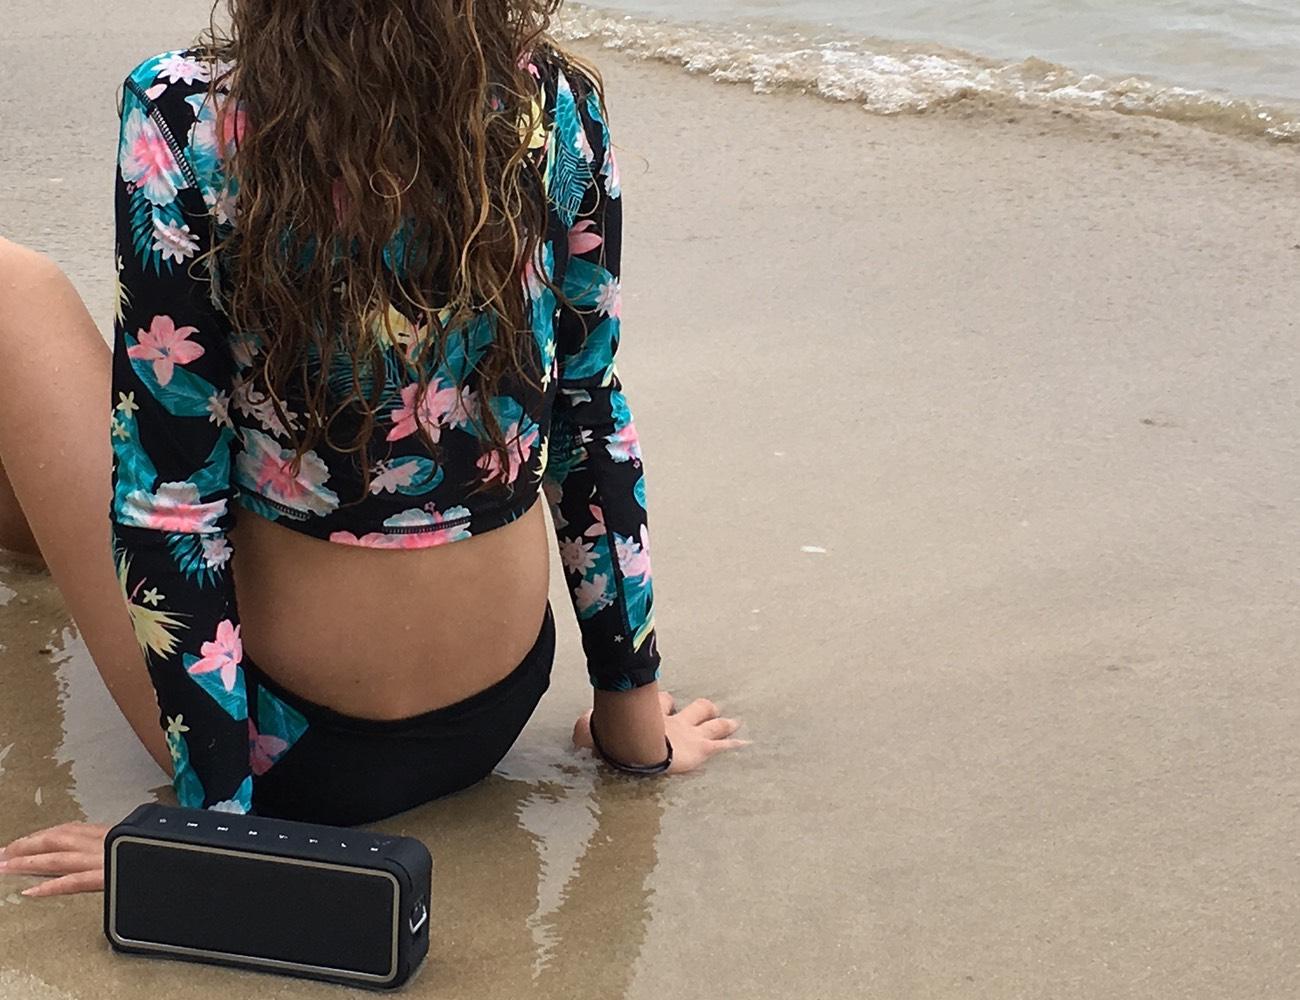 Buoy – Real Waterproof Speaker & 20 Amazing Features